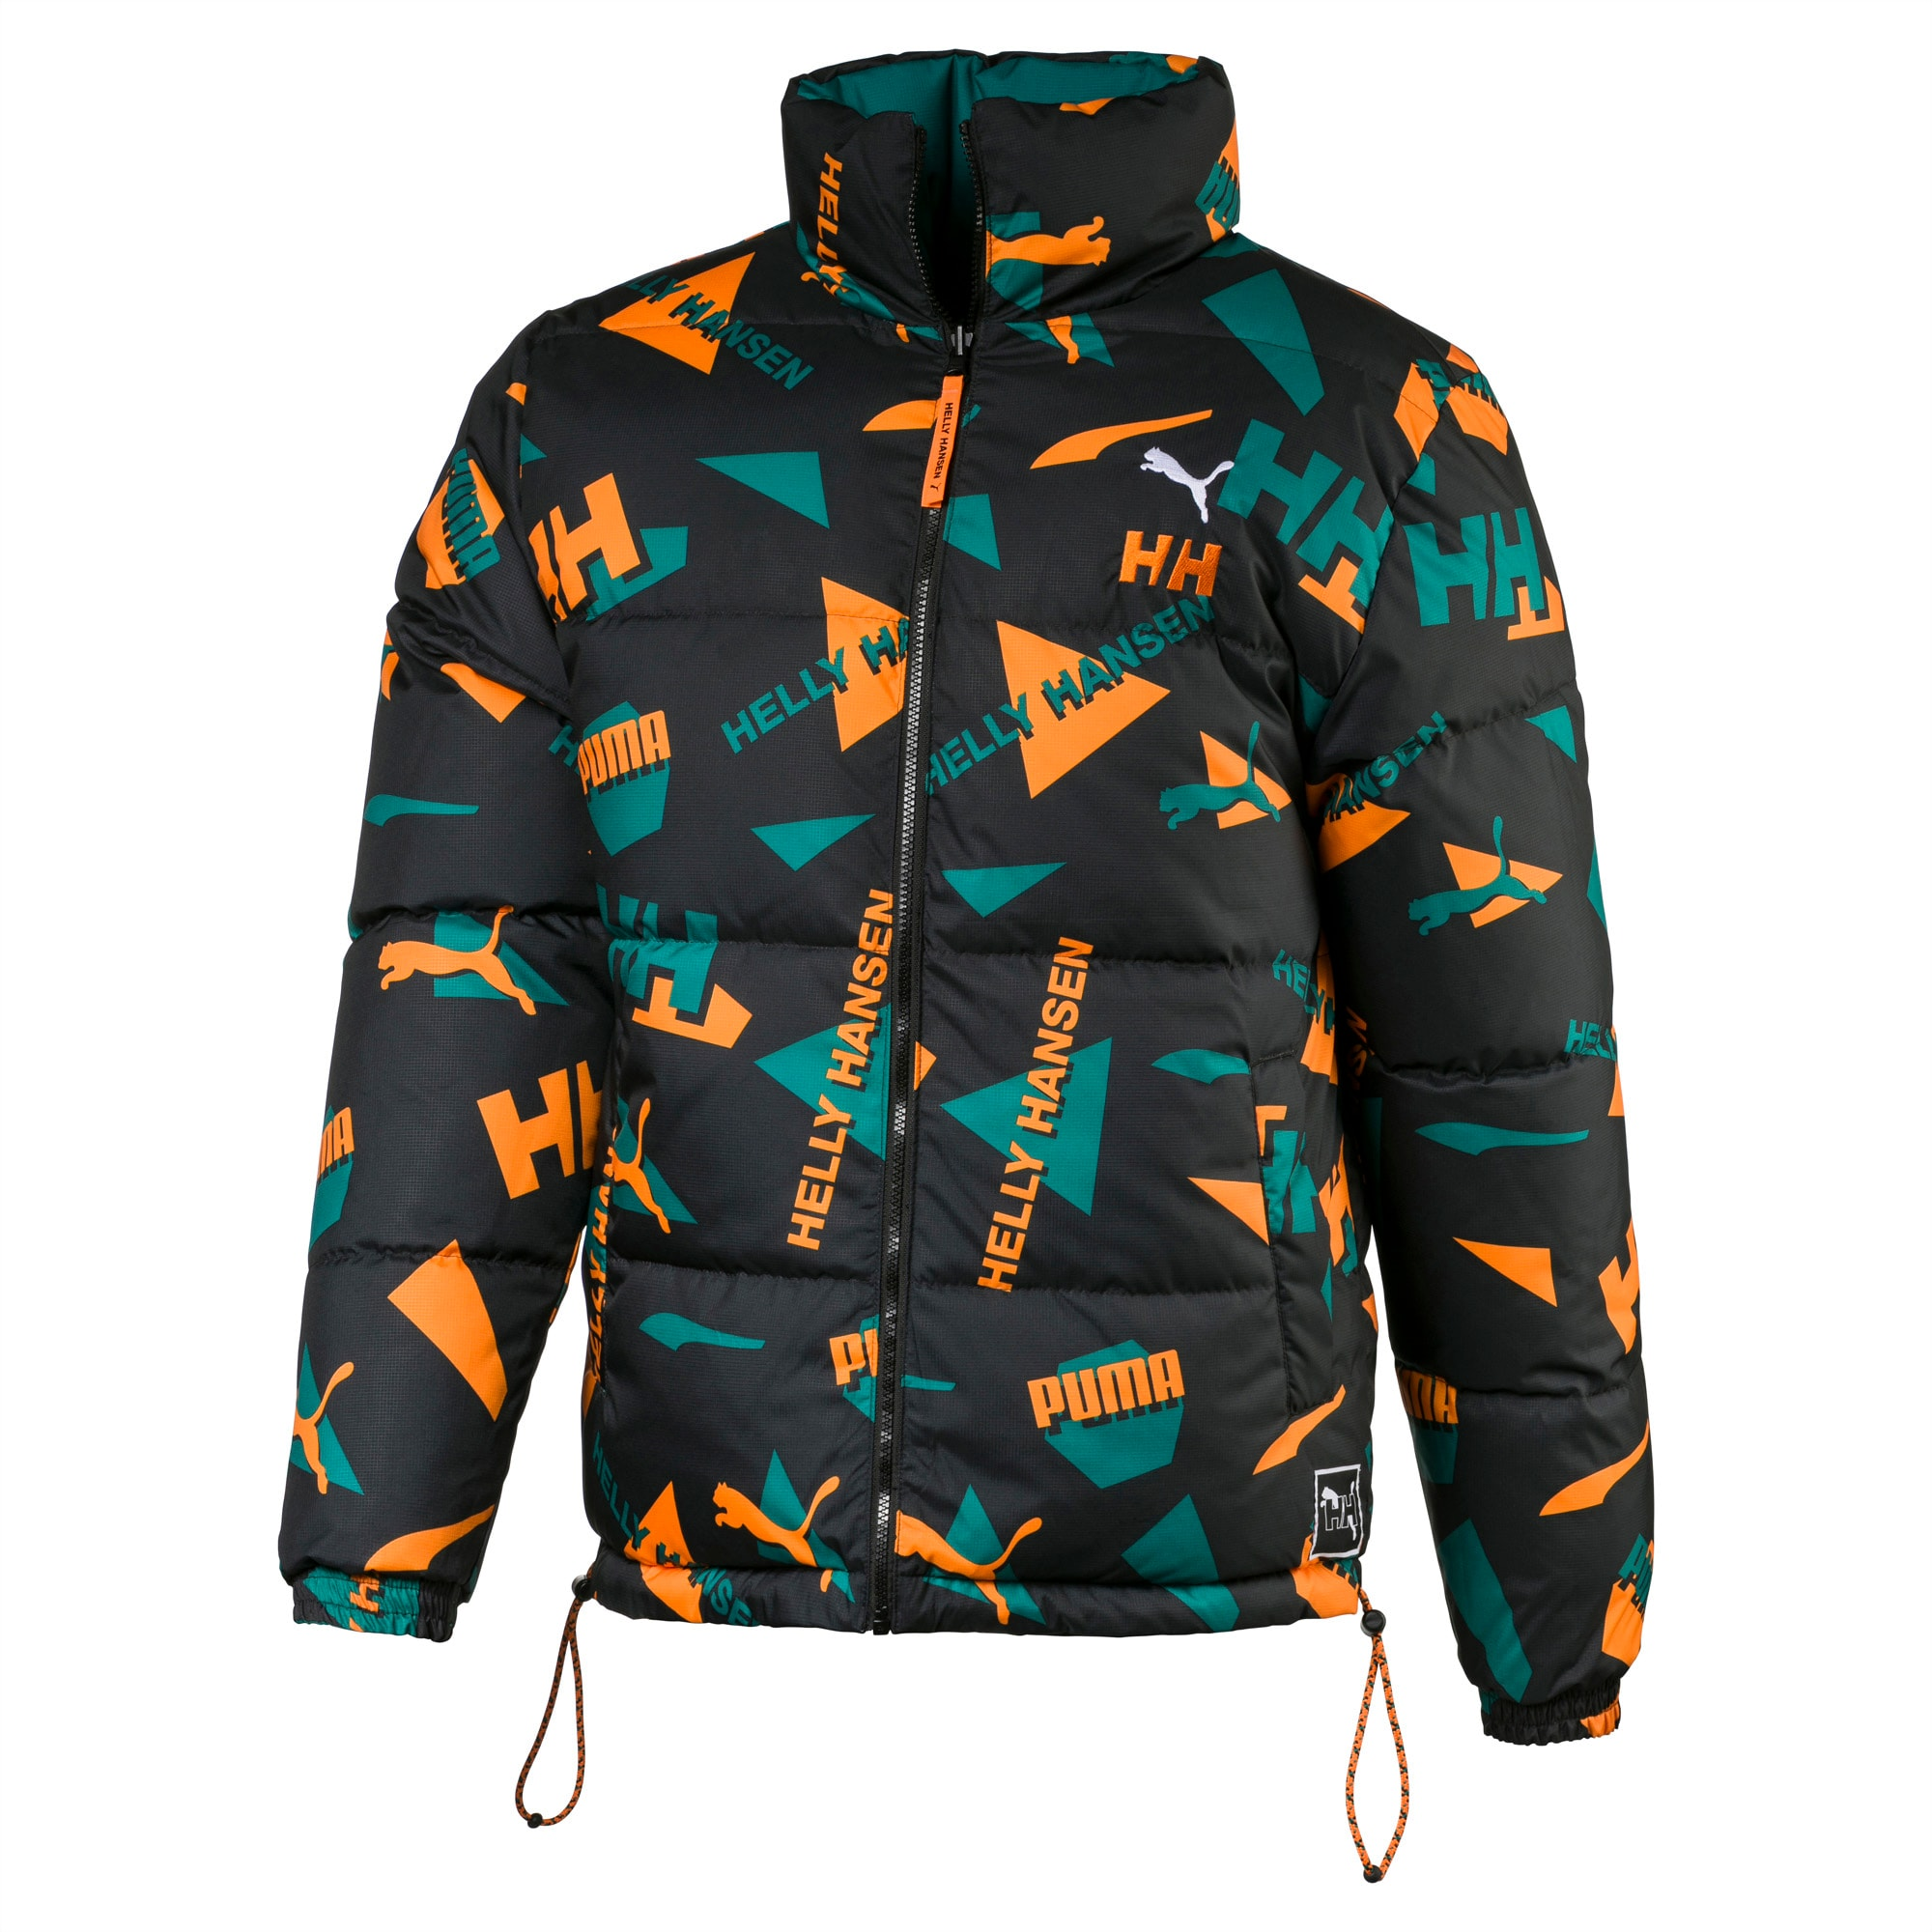 PUMA x HELLY HANSEN Jacket